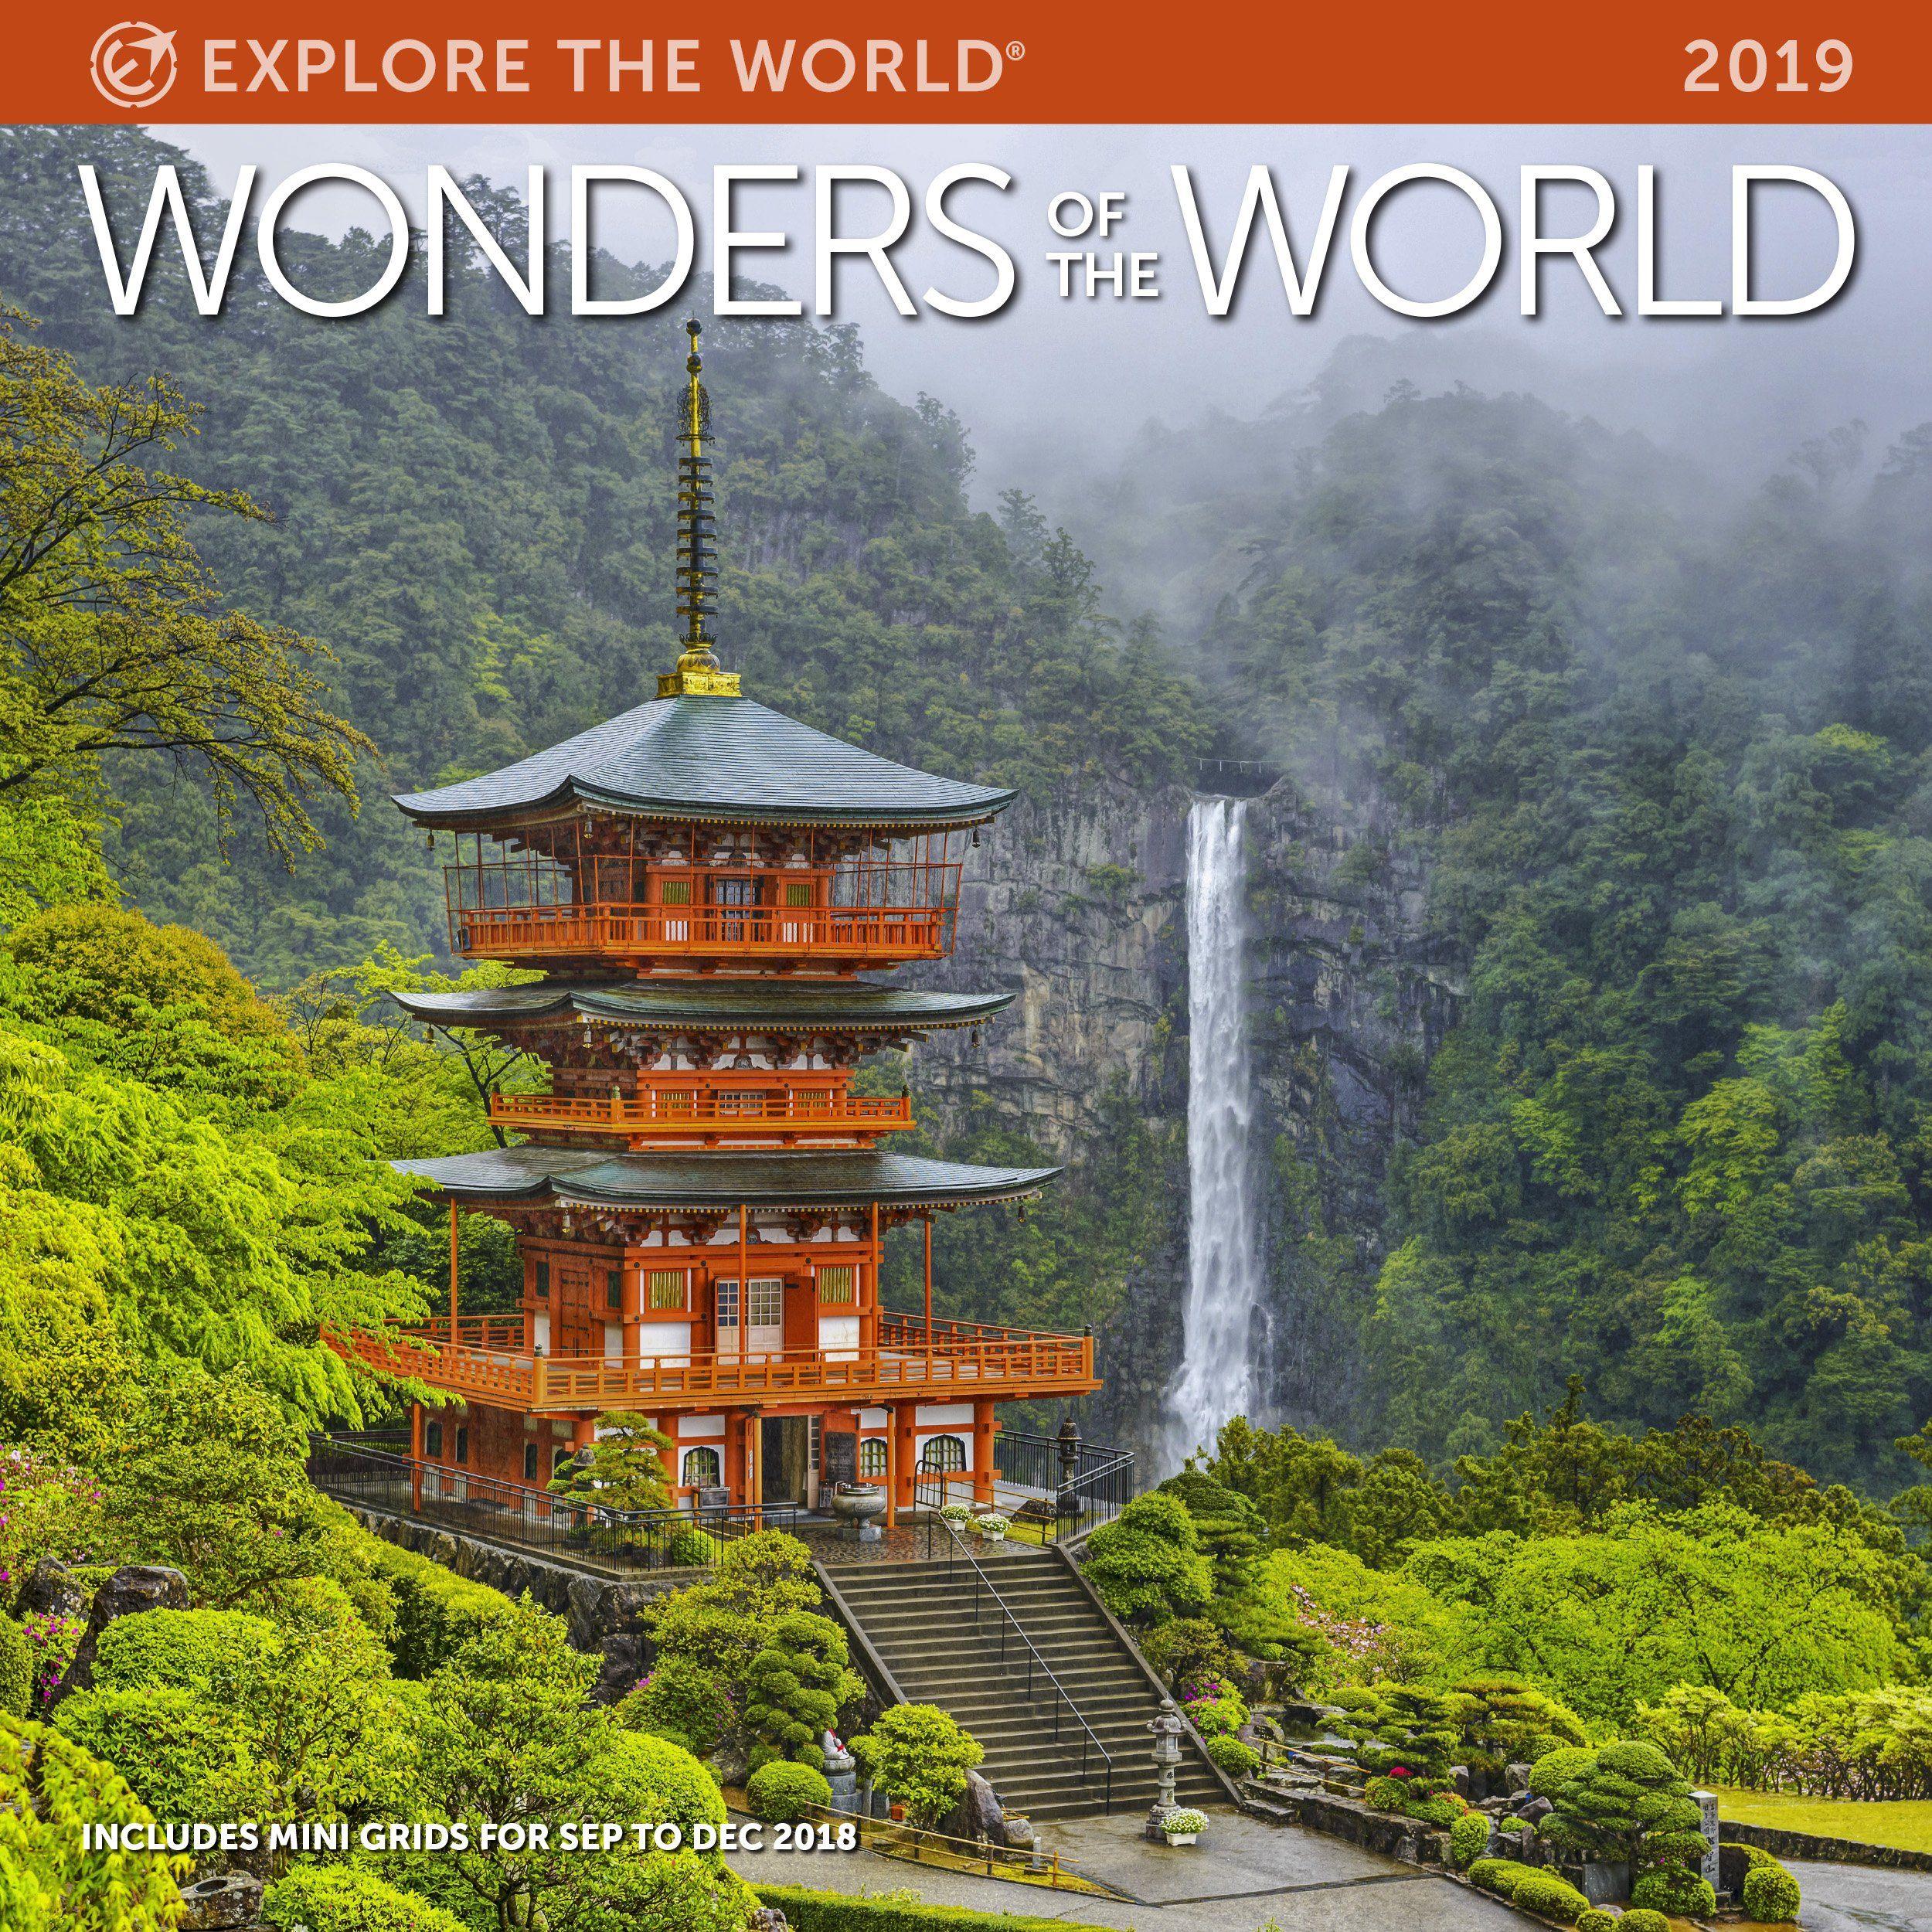 f4c73e7f5f2f8 Wonders of the World Wall Calendar 2019